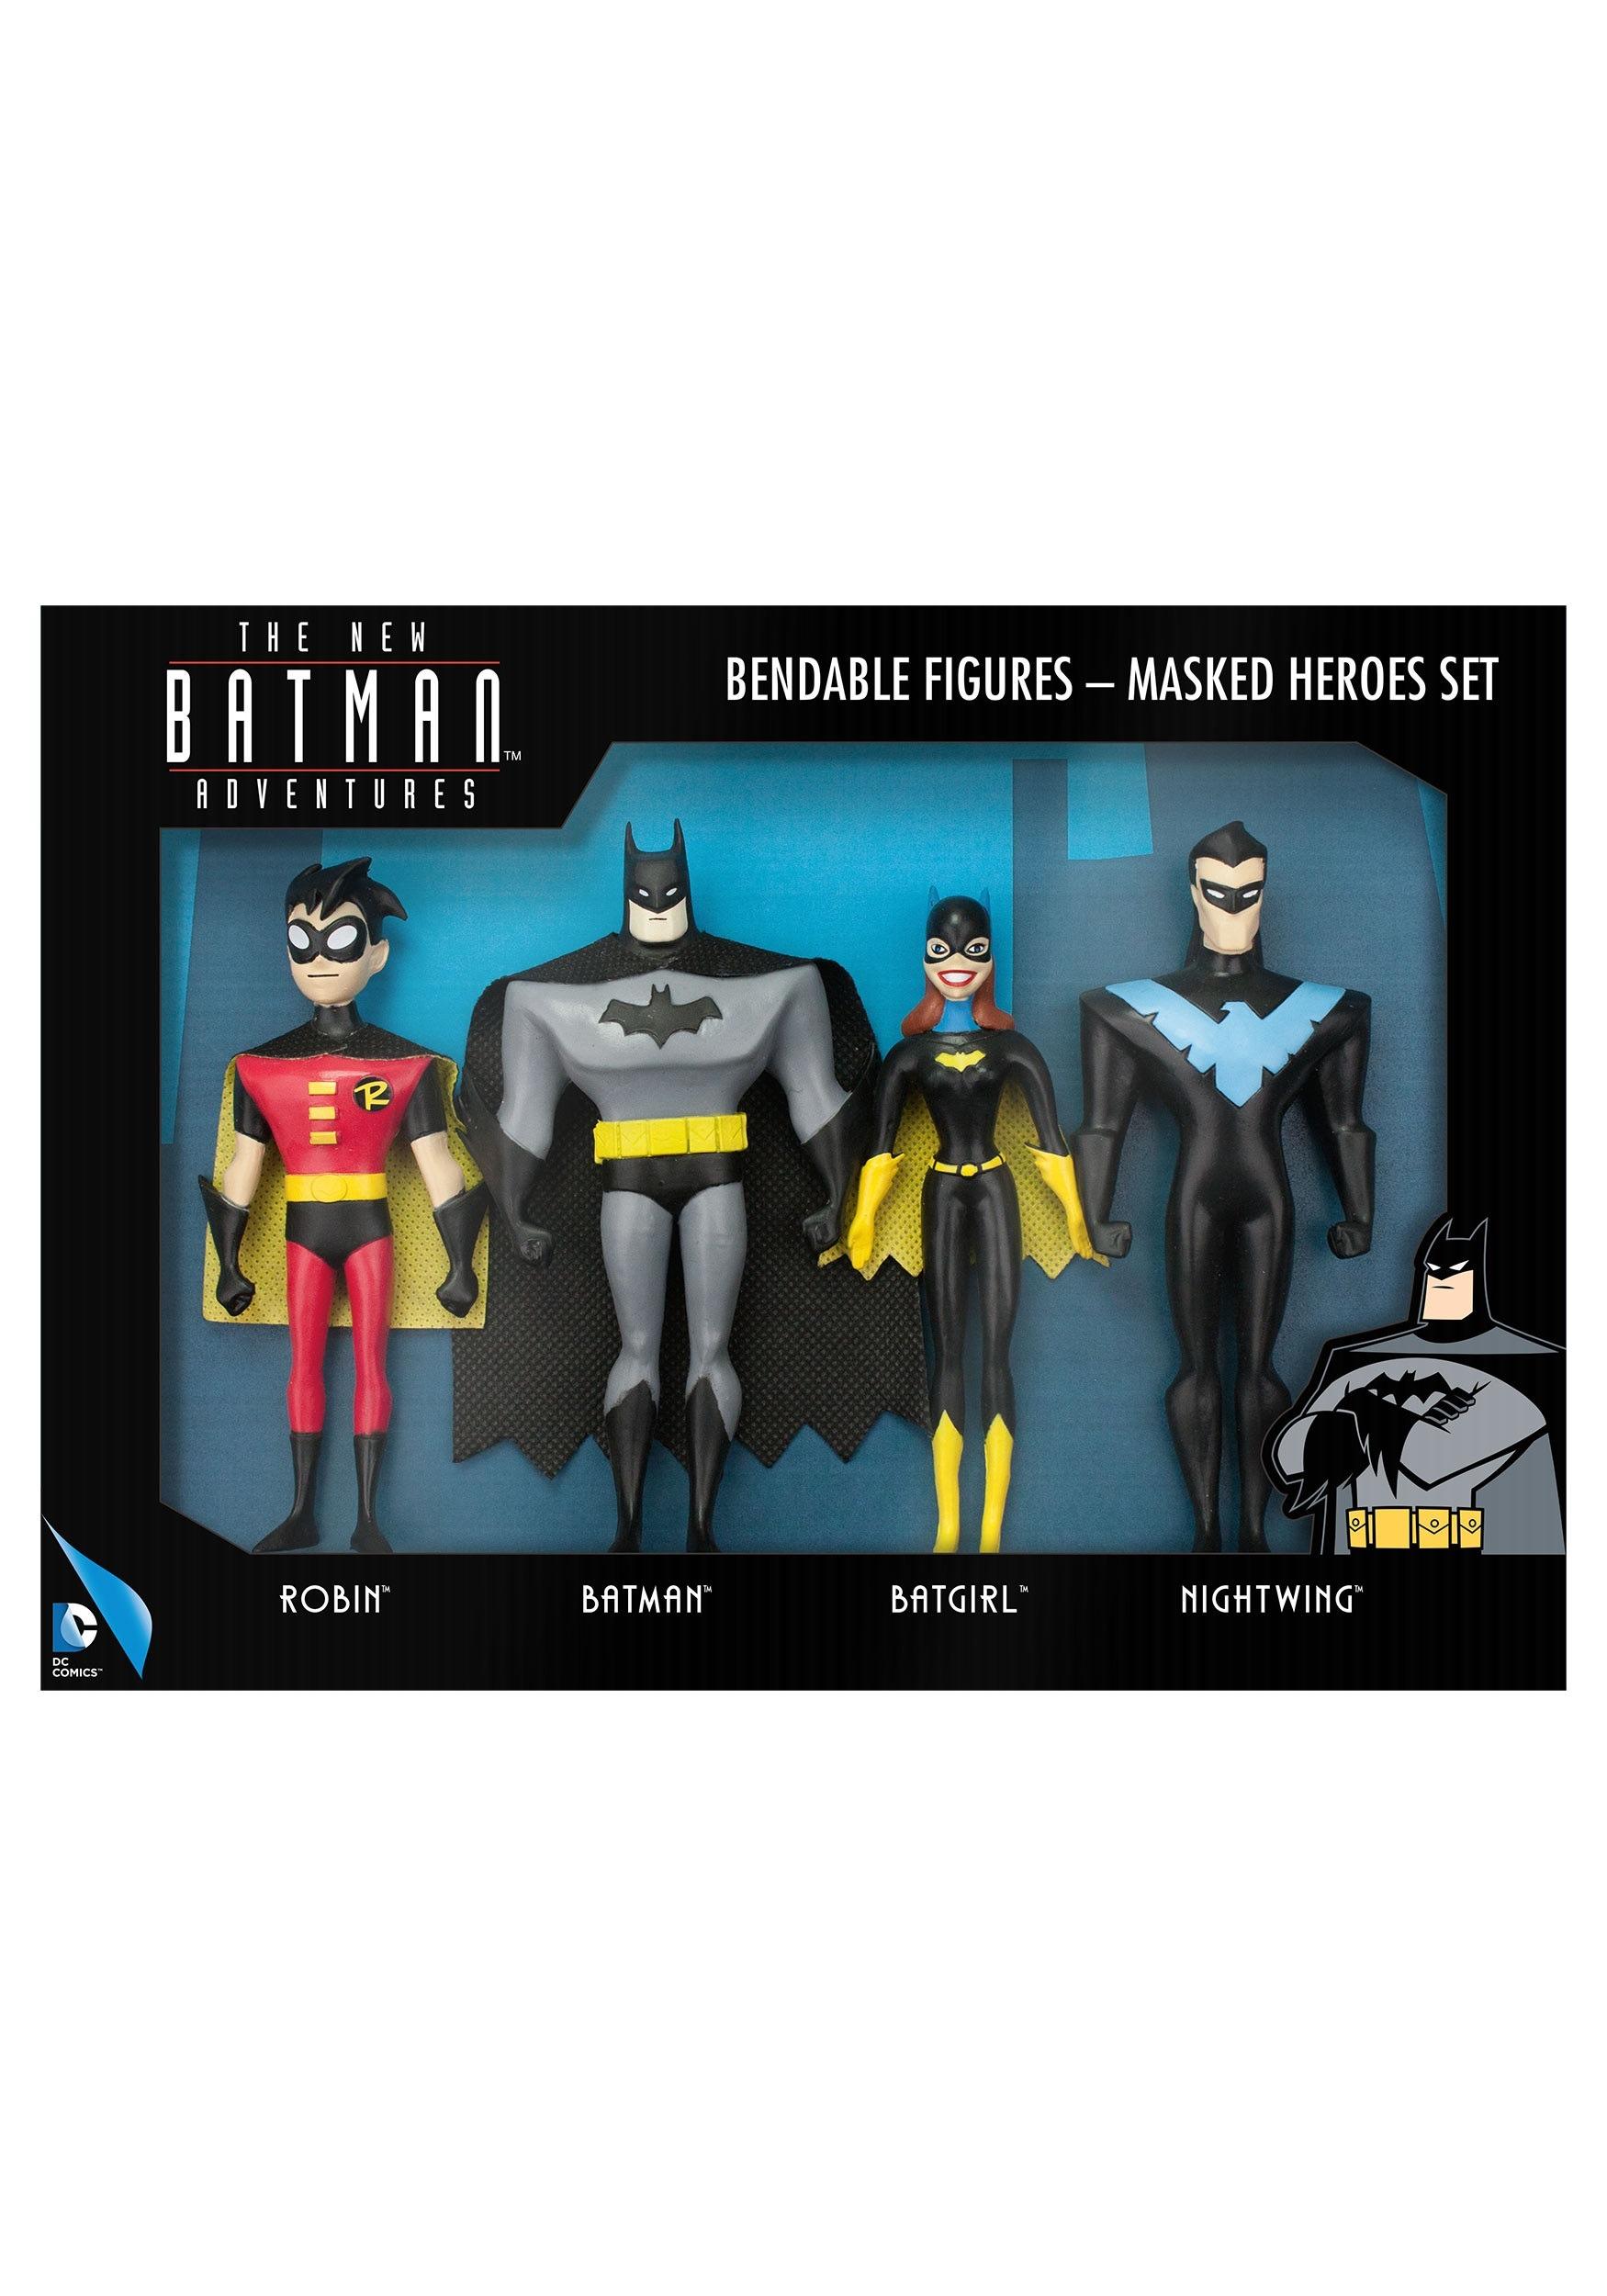 The New Batman Adventures Masked Heroes Set NJCDC3956-1600